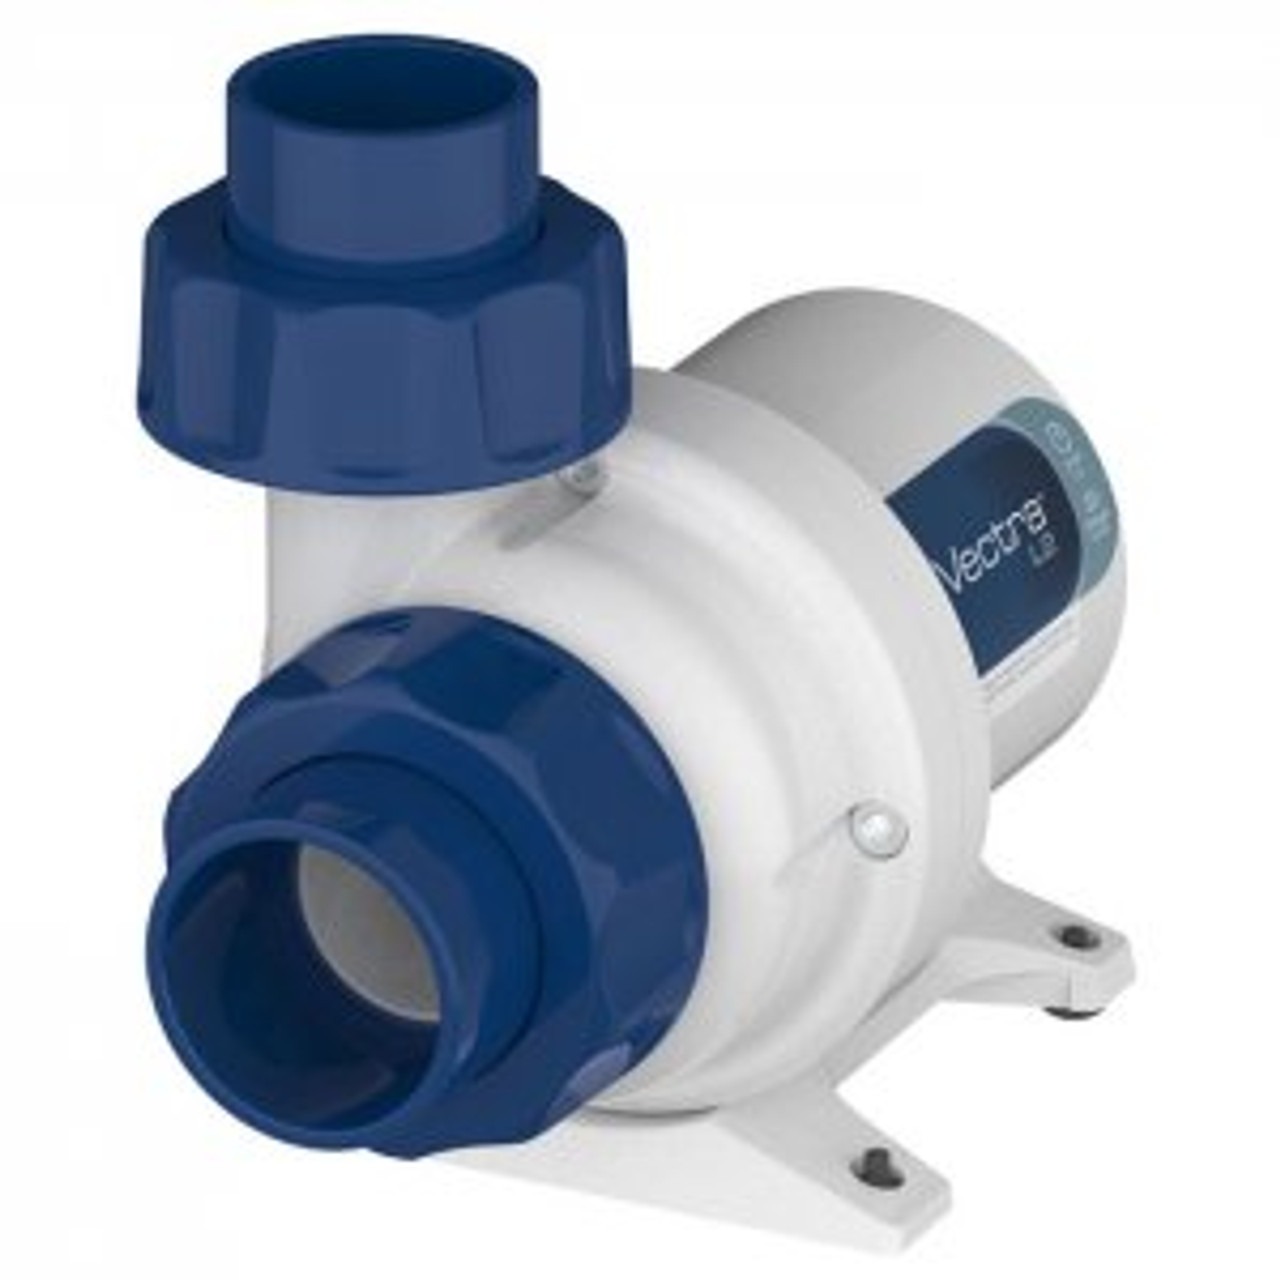 Eco Tech Marine Vectra L 2 DC Pump, Specifications: Max Flow - 3100 GPH (VECTRA L2)